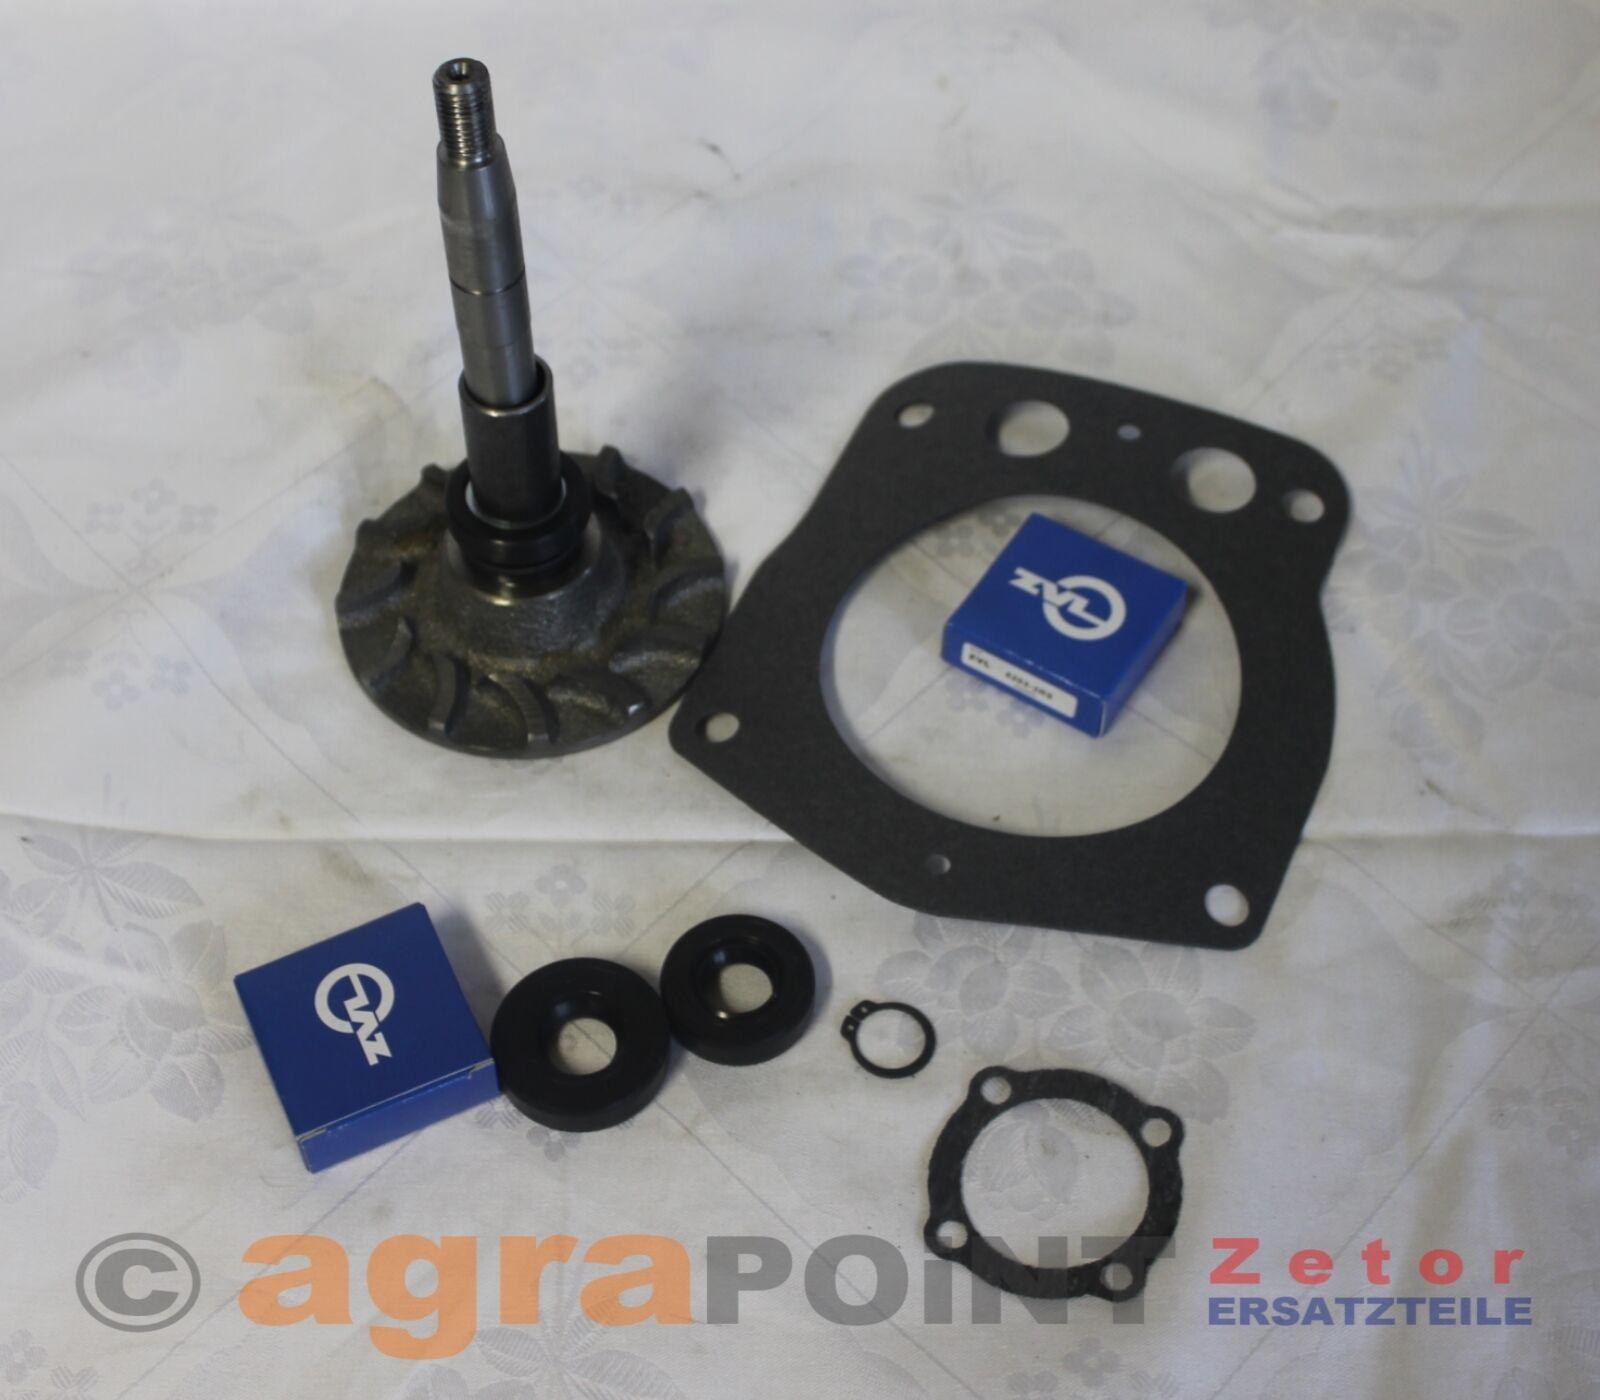 Zetor 25A K - Wasserpumpe - Reparatur-Set - Z25800.07 - by agrapoint